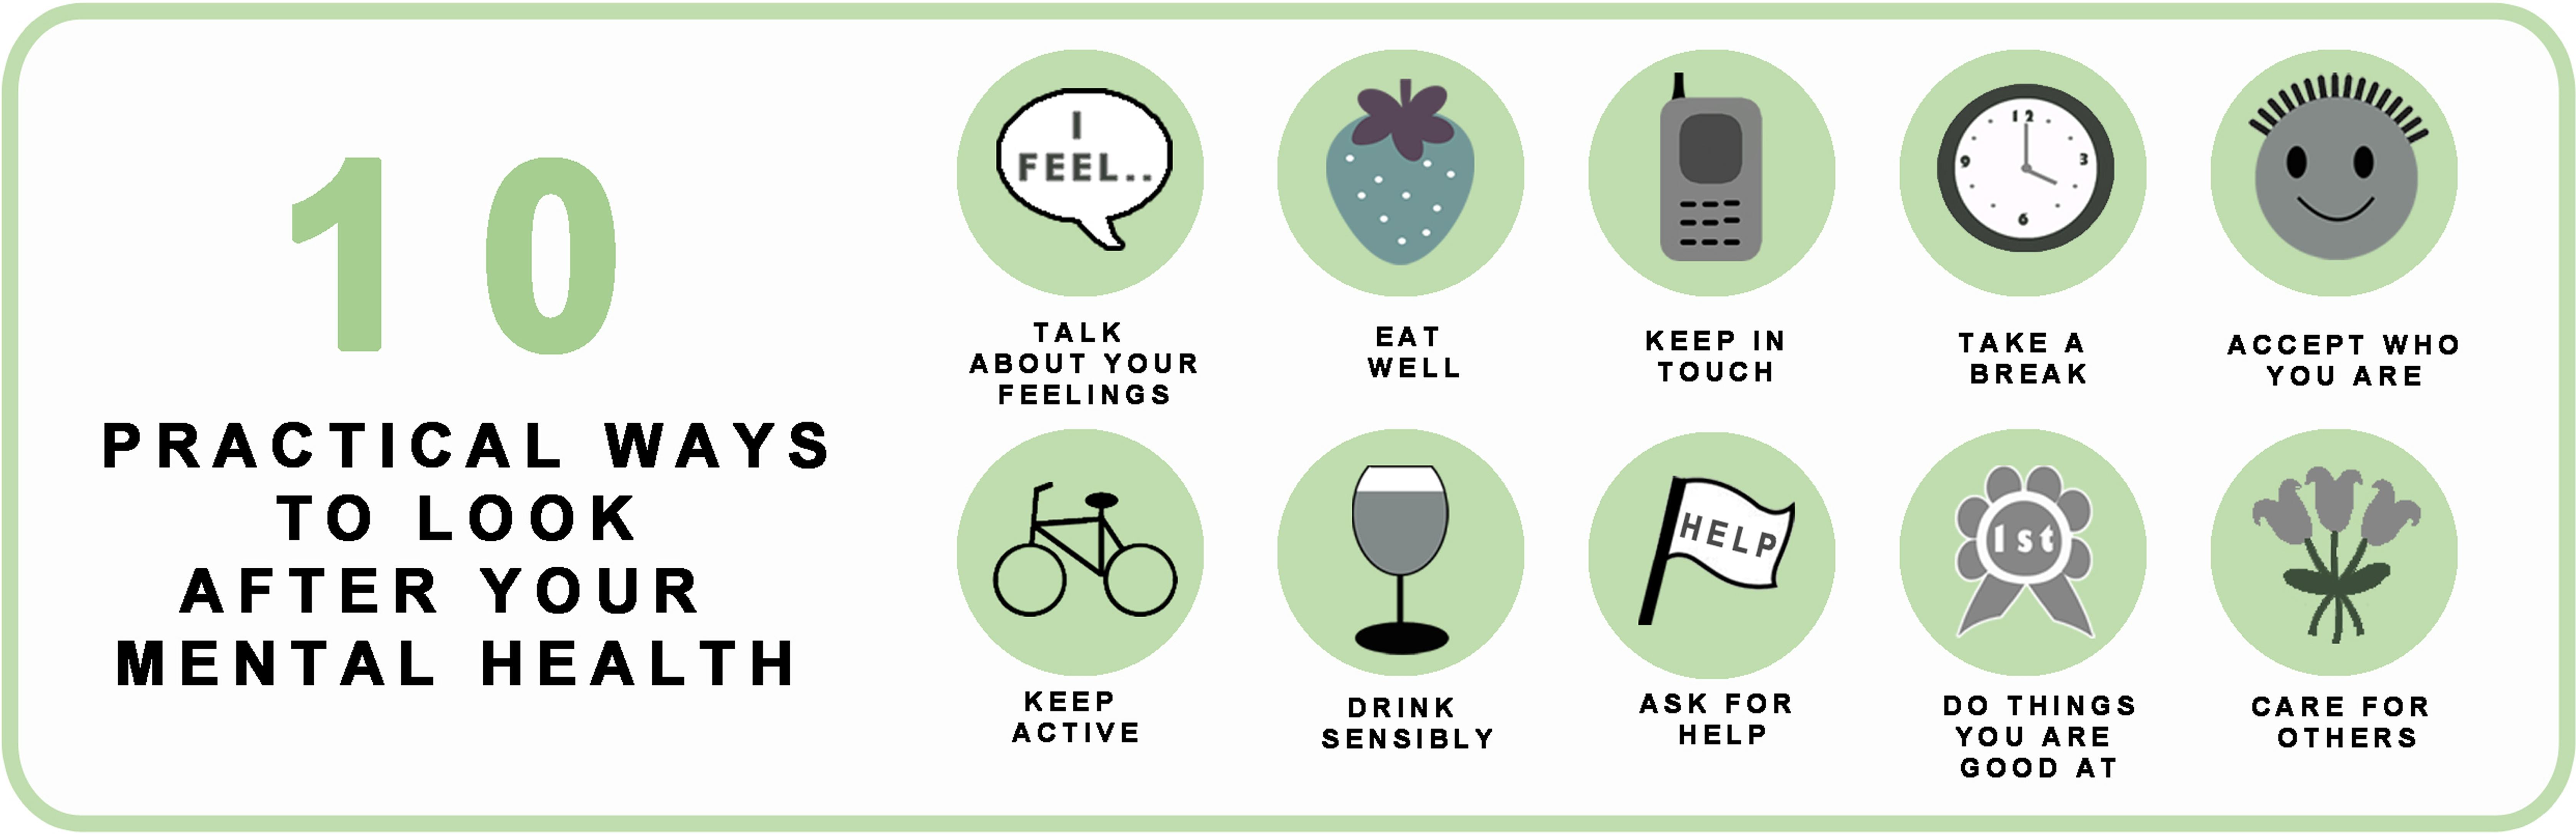 15 Most Practical Ways To Improve Yourself: The Bradford On Avon & Melksham Health Partnership